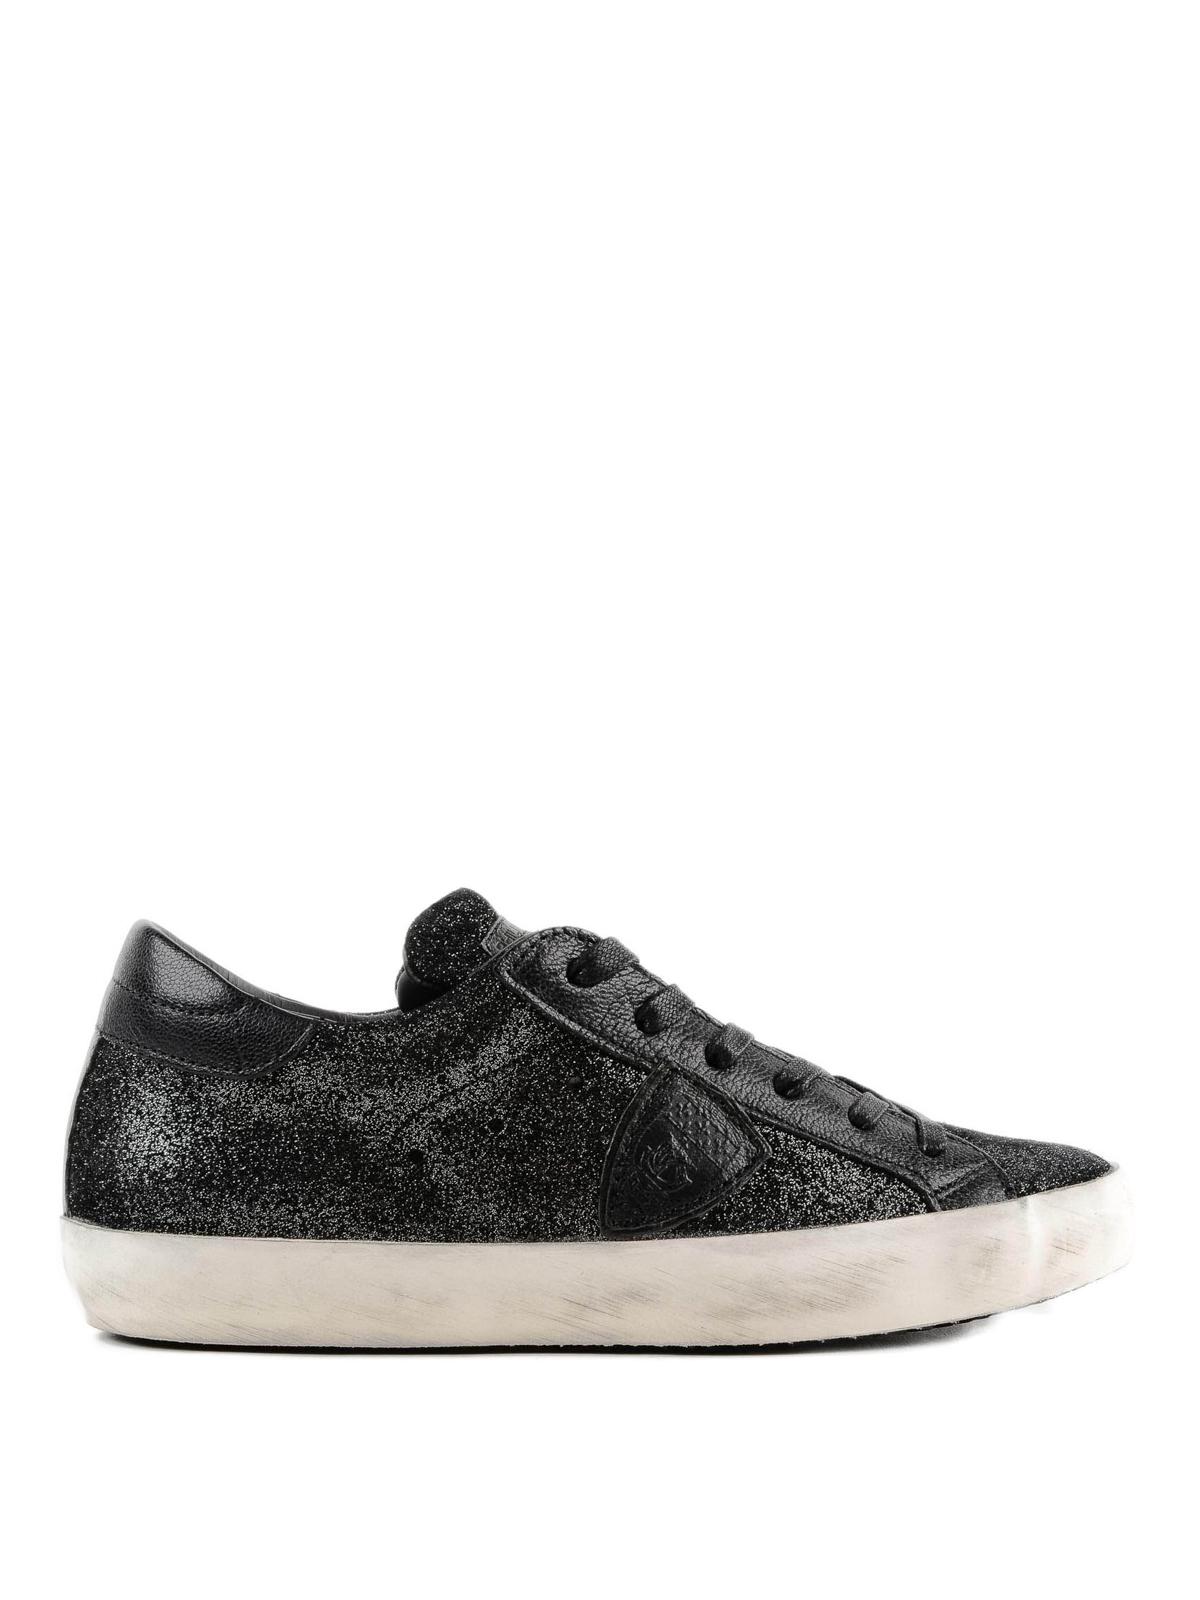 7680fd9a0 philippe-model-trainers-paris-glitter-black-sneakers-00000134139f00s001.jpg